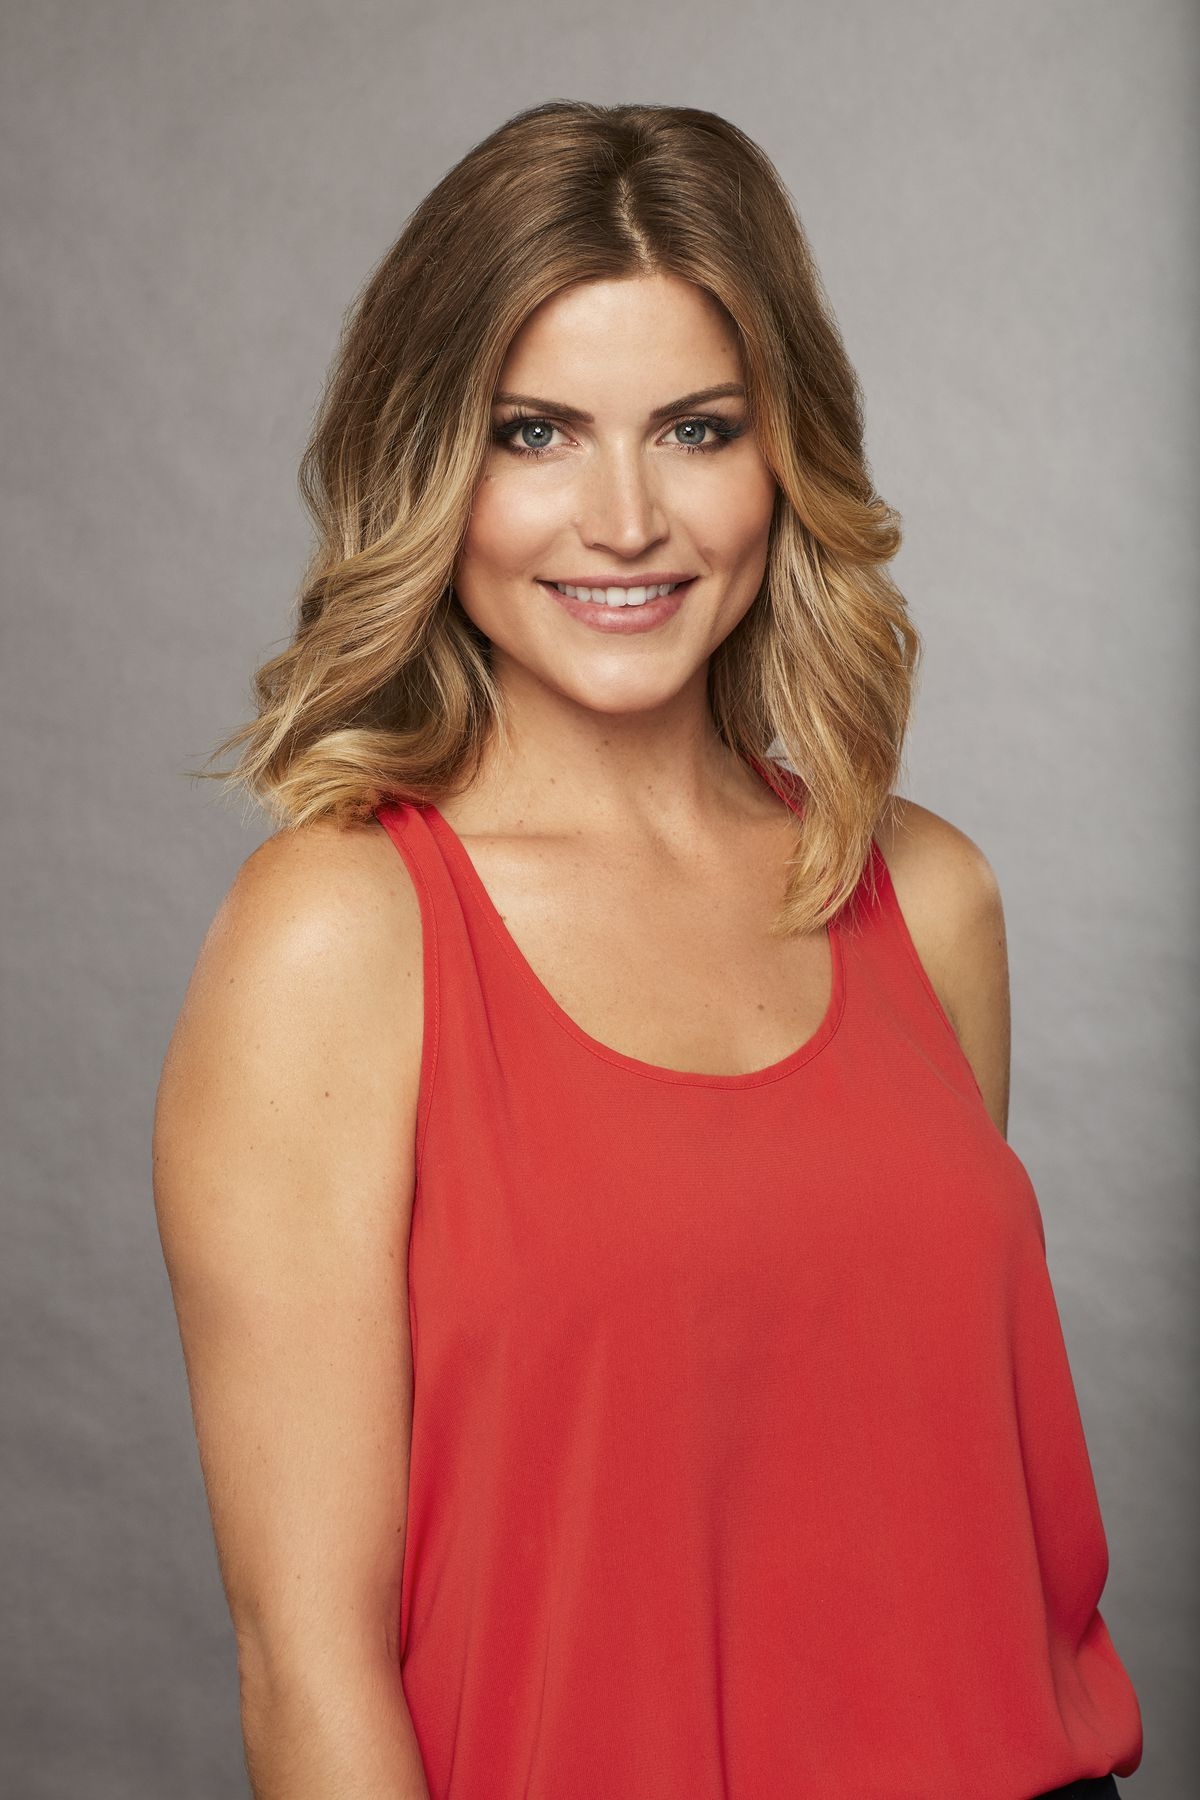 Bachelor contestant Chelsea, 29